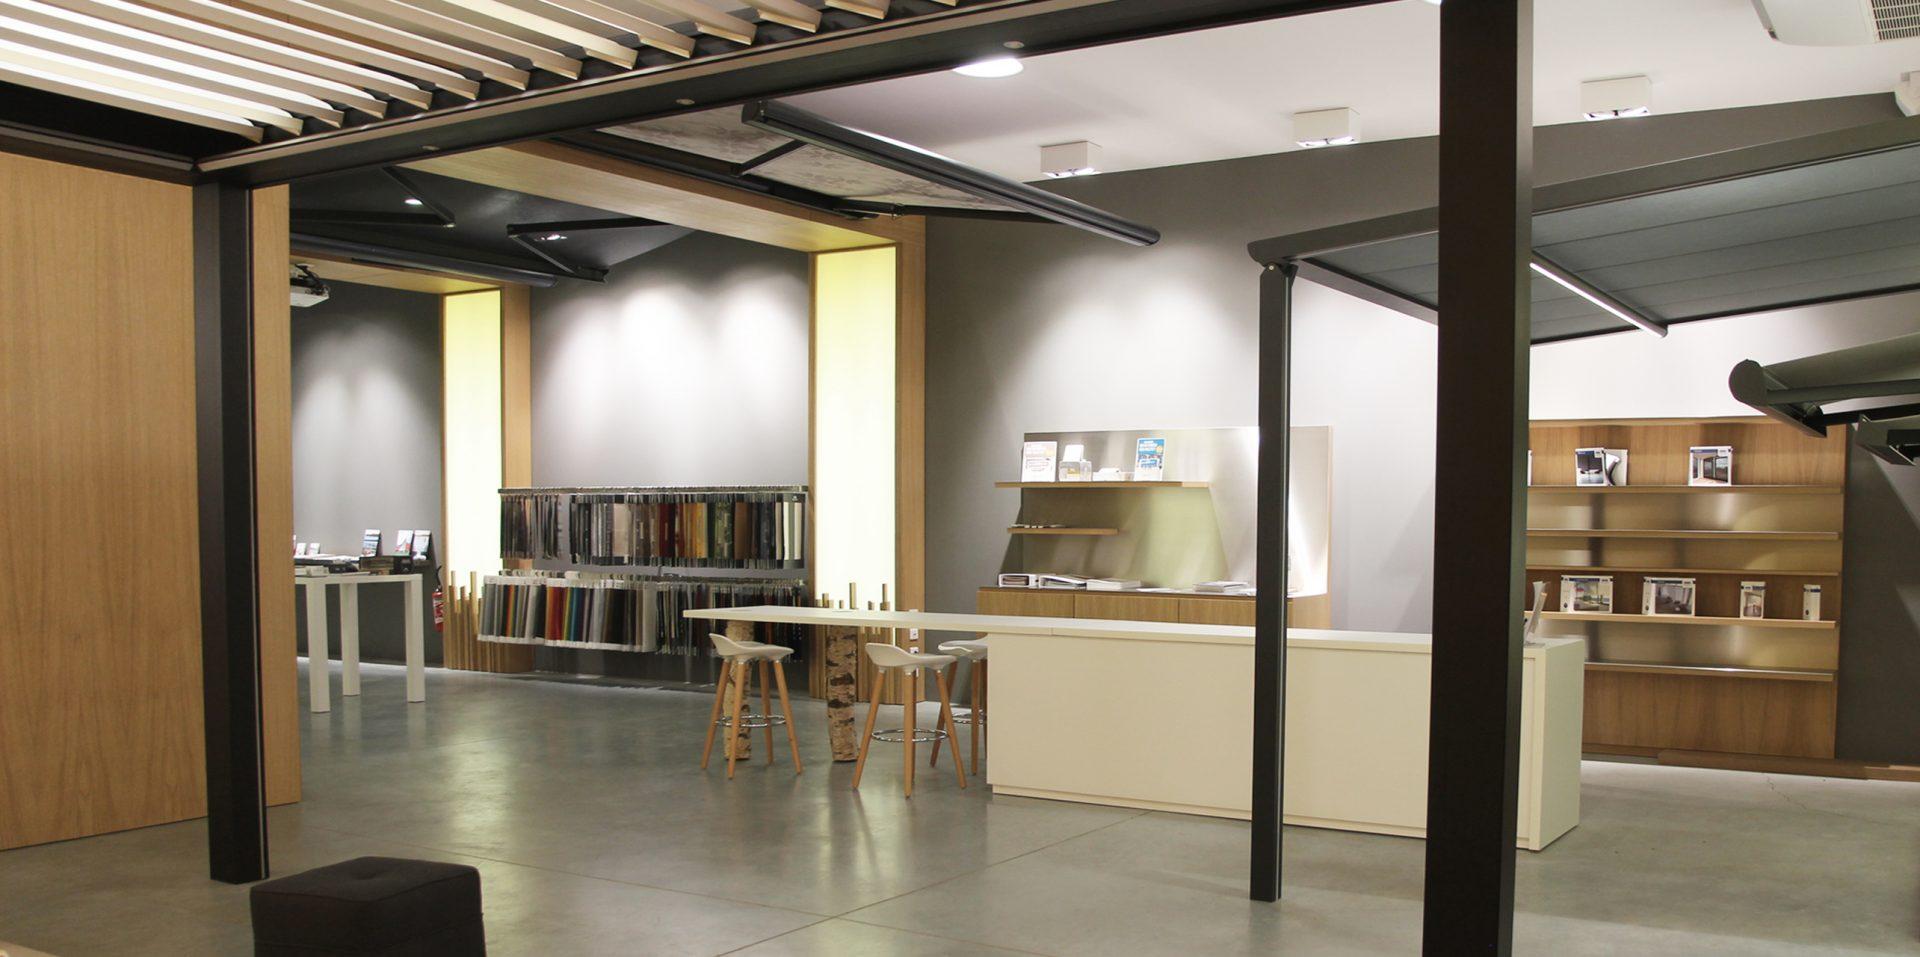 Showroom Stores de France showroom aménagemant inérieur